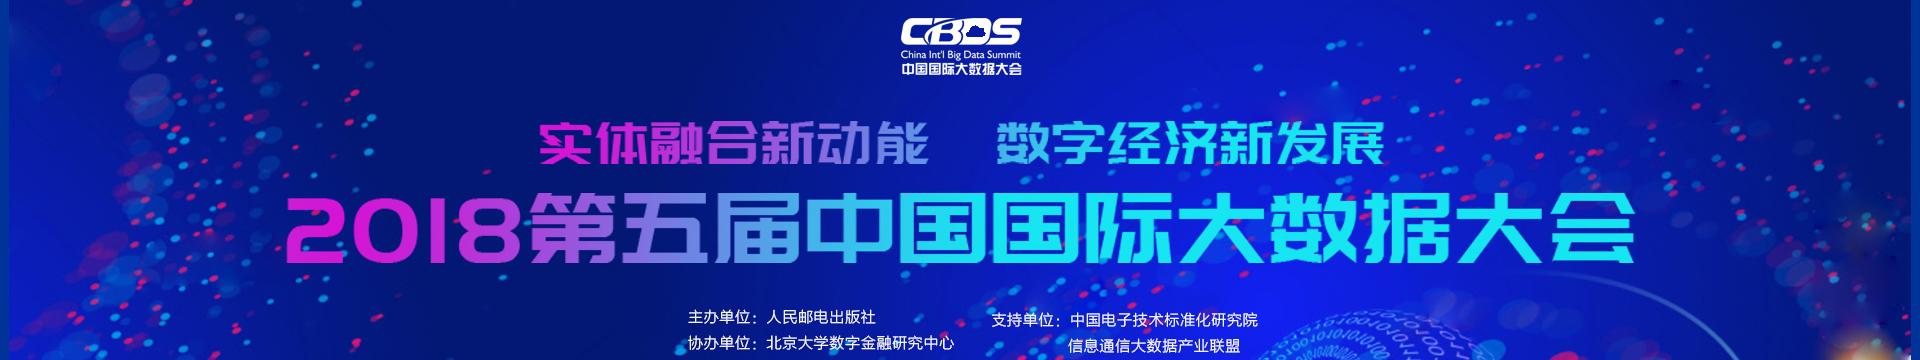 CBDS 2018第五届大数据大会(China International Big Data Summit)